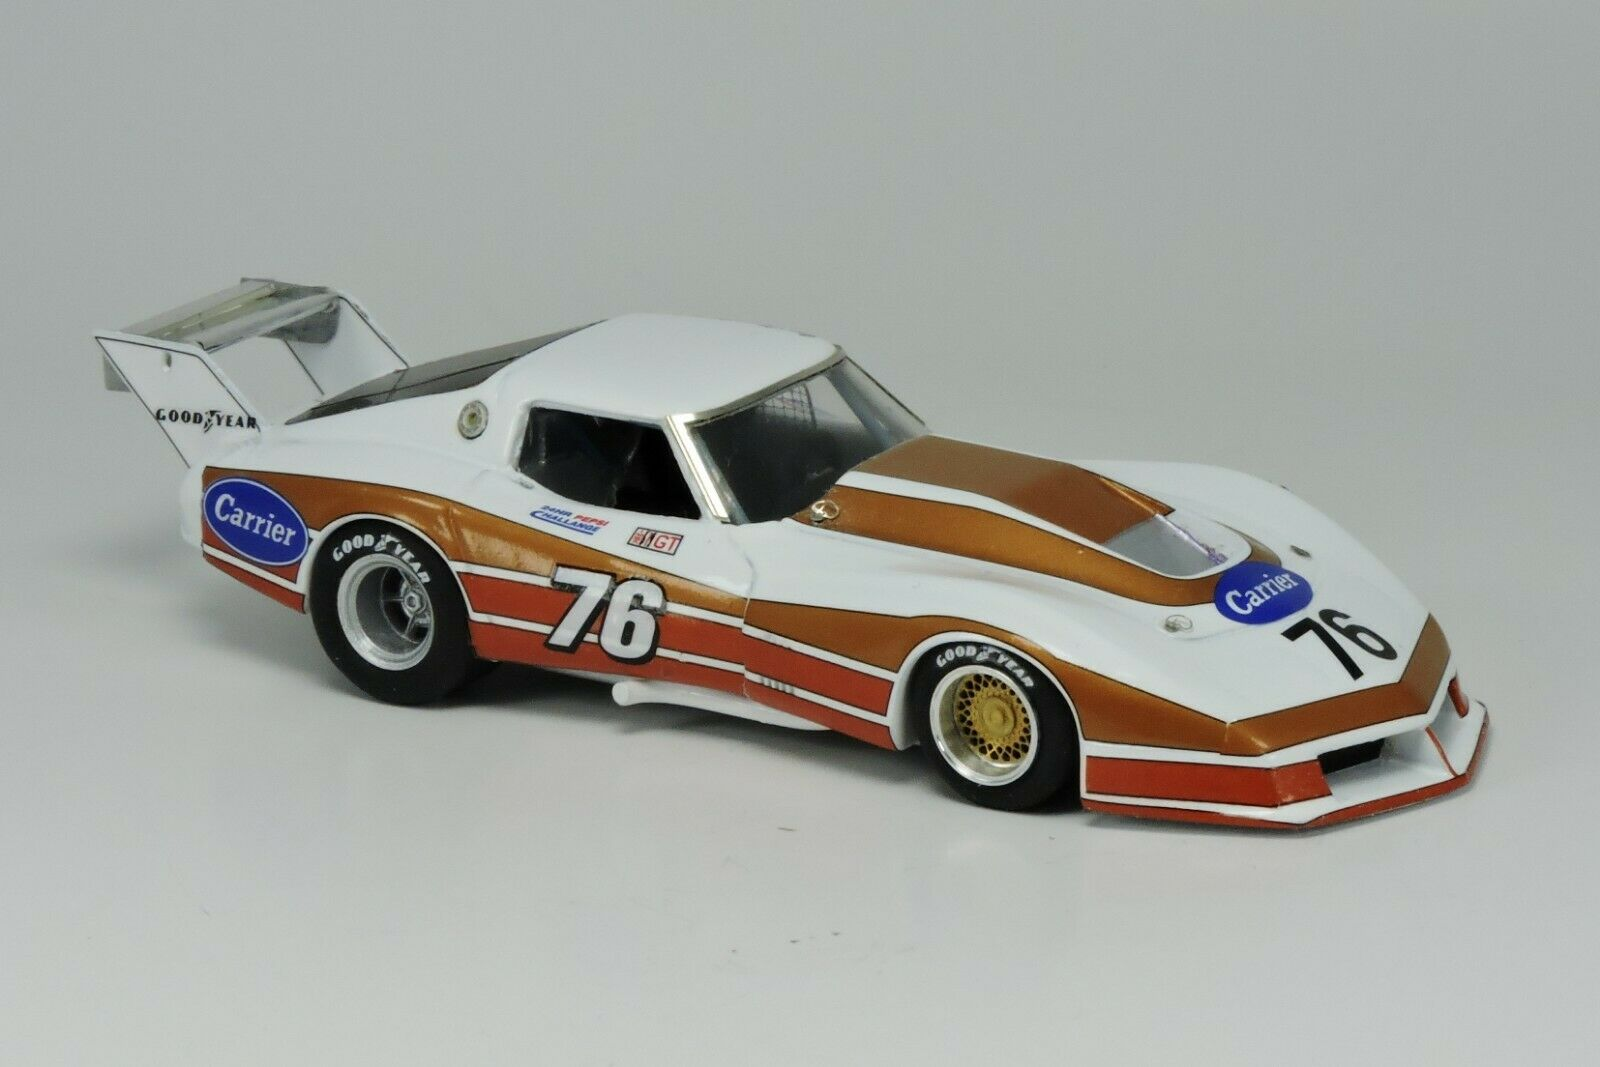 kit Corvette C3 Tubular Frame  76  Riverside 1980 - Arena Models kit 1 43  expédition rapide et meilleur service